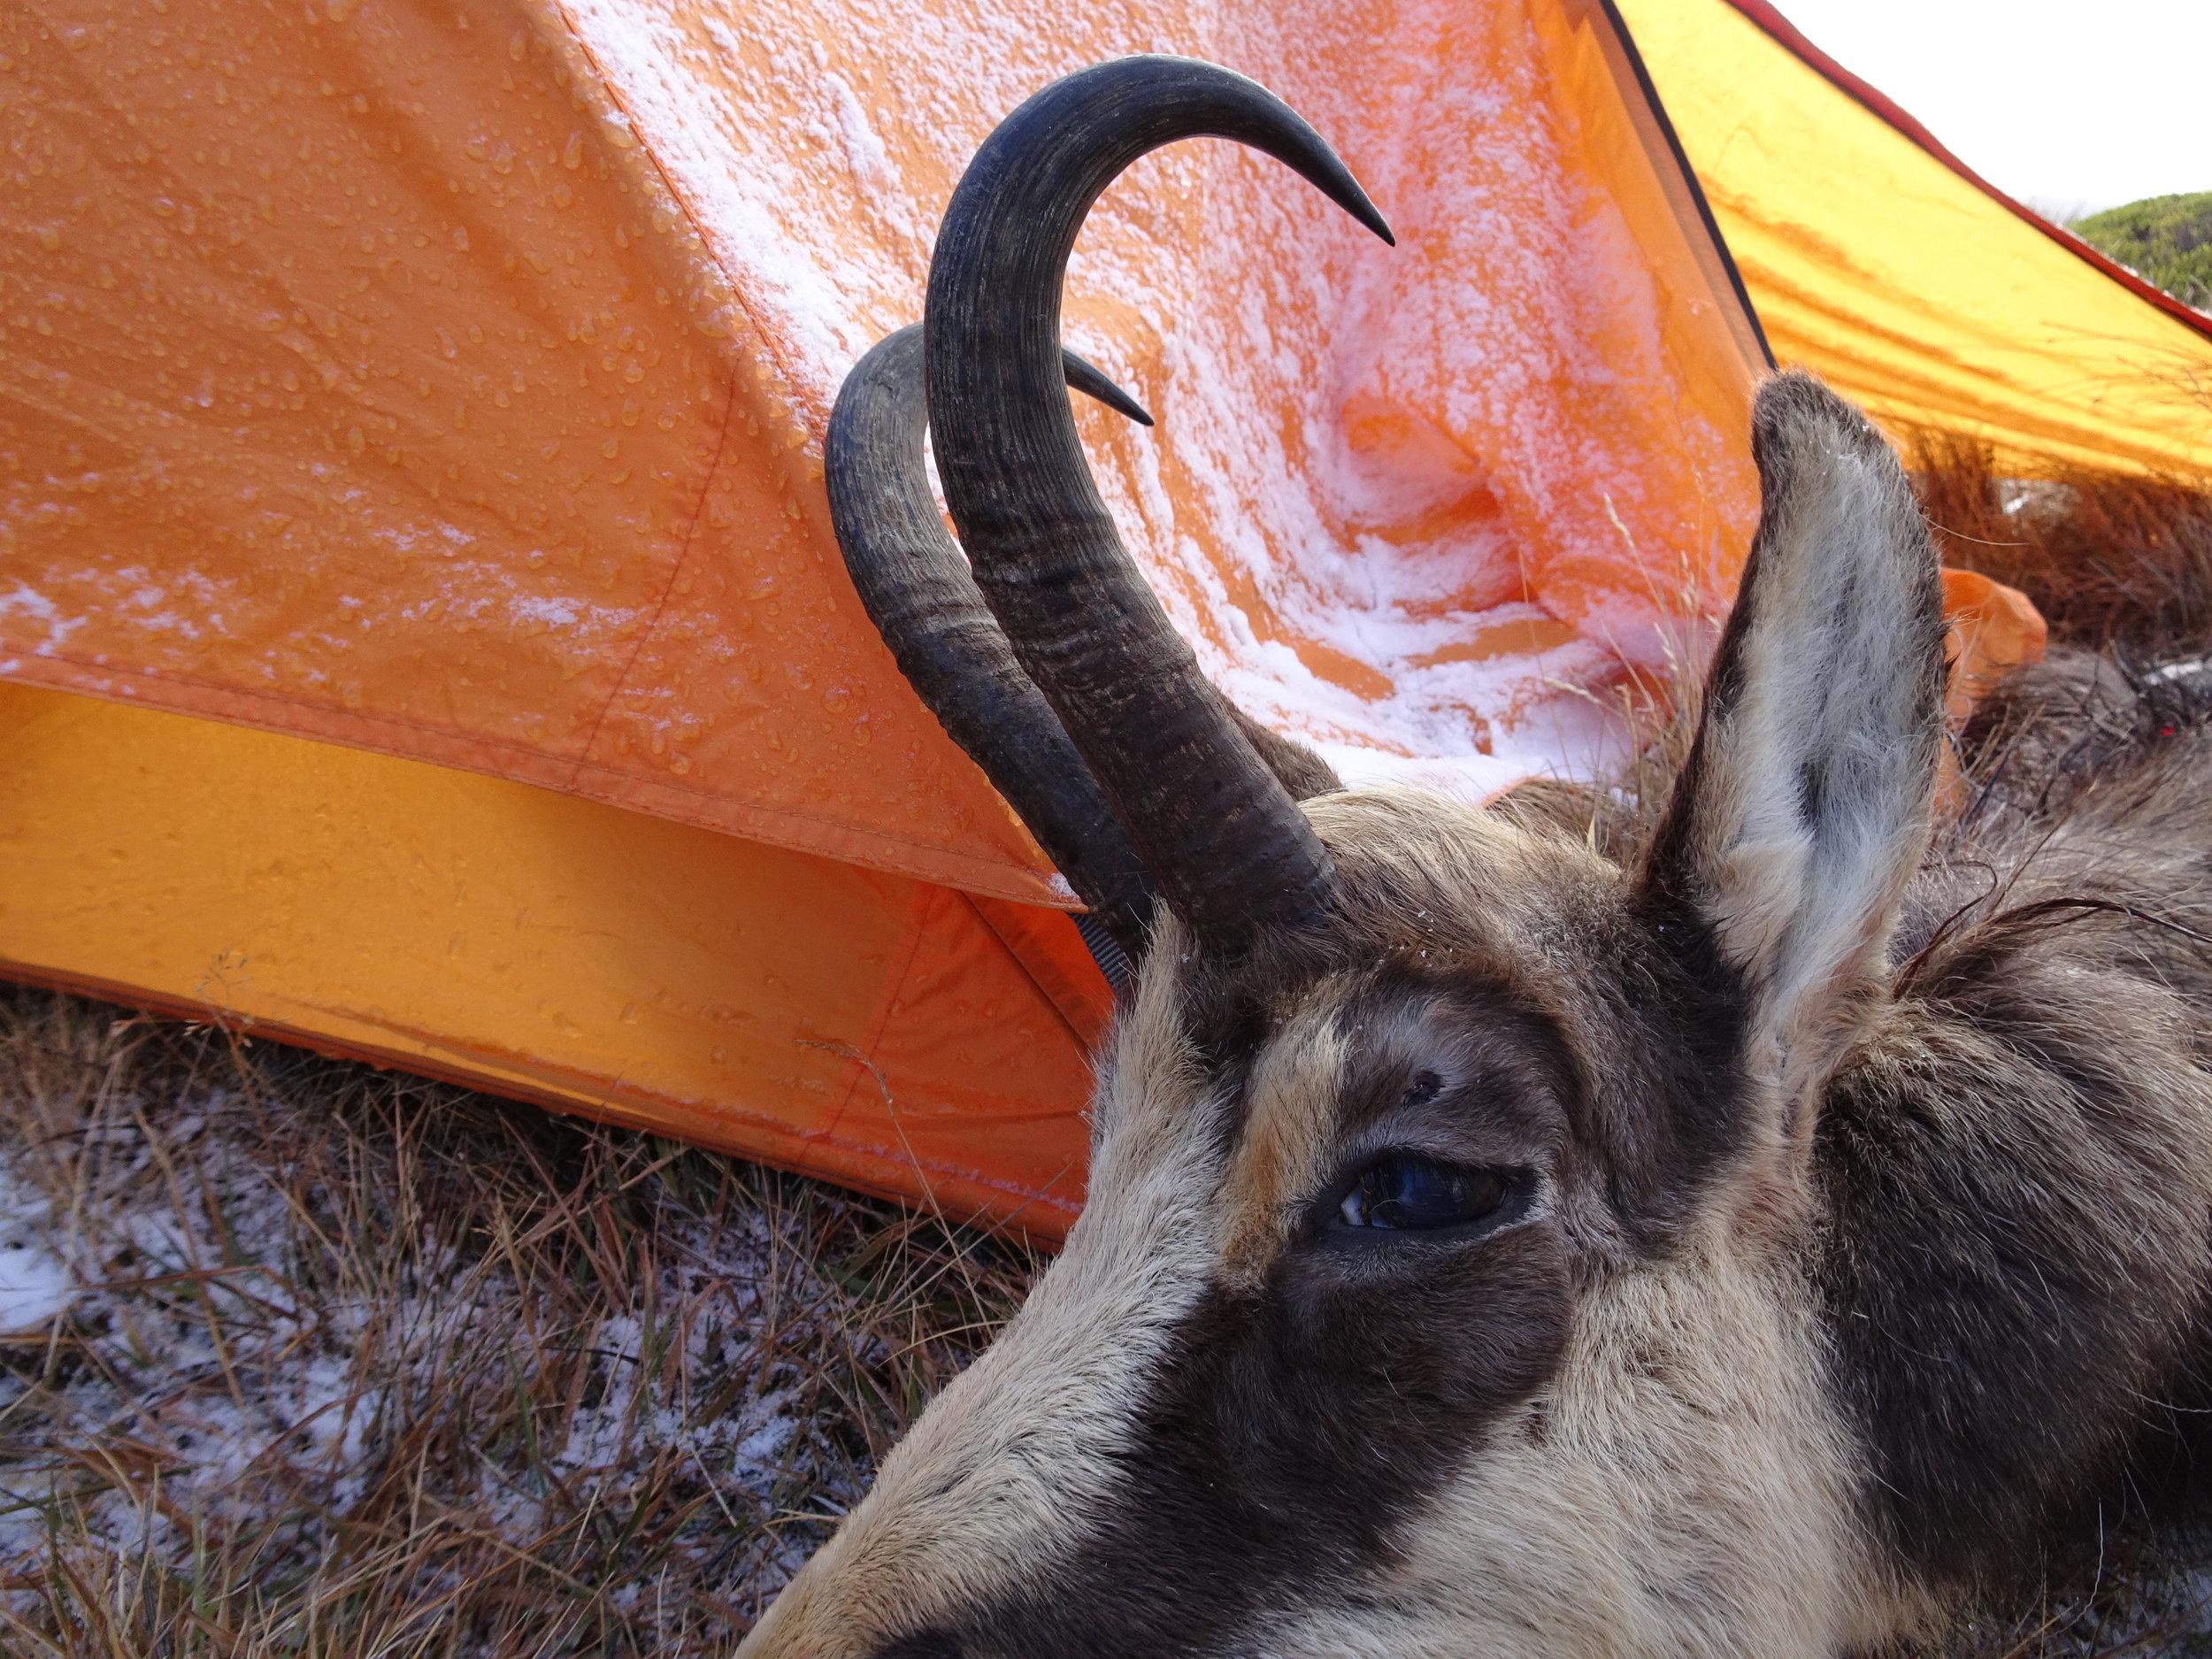 Chamois buck. Image @ PointsSouth